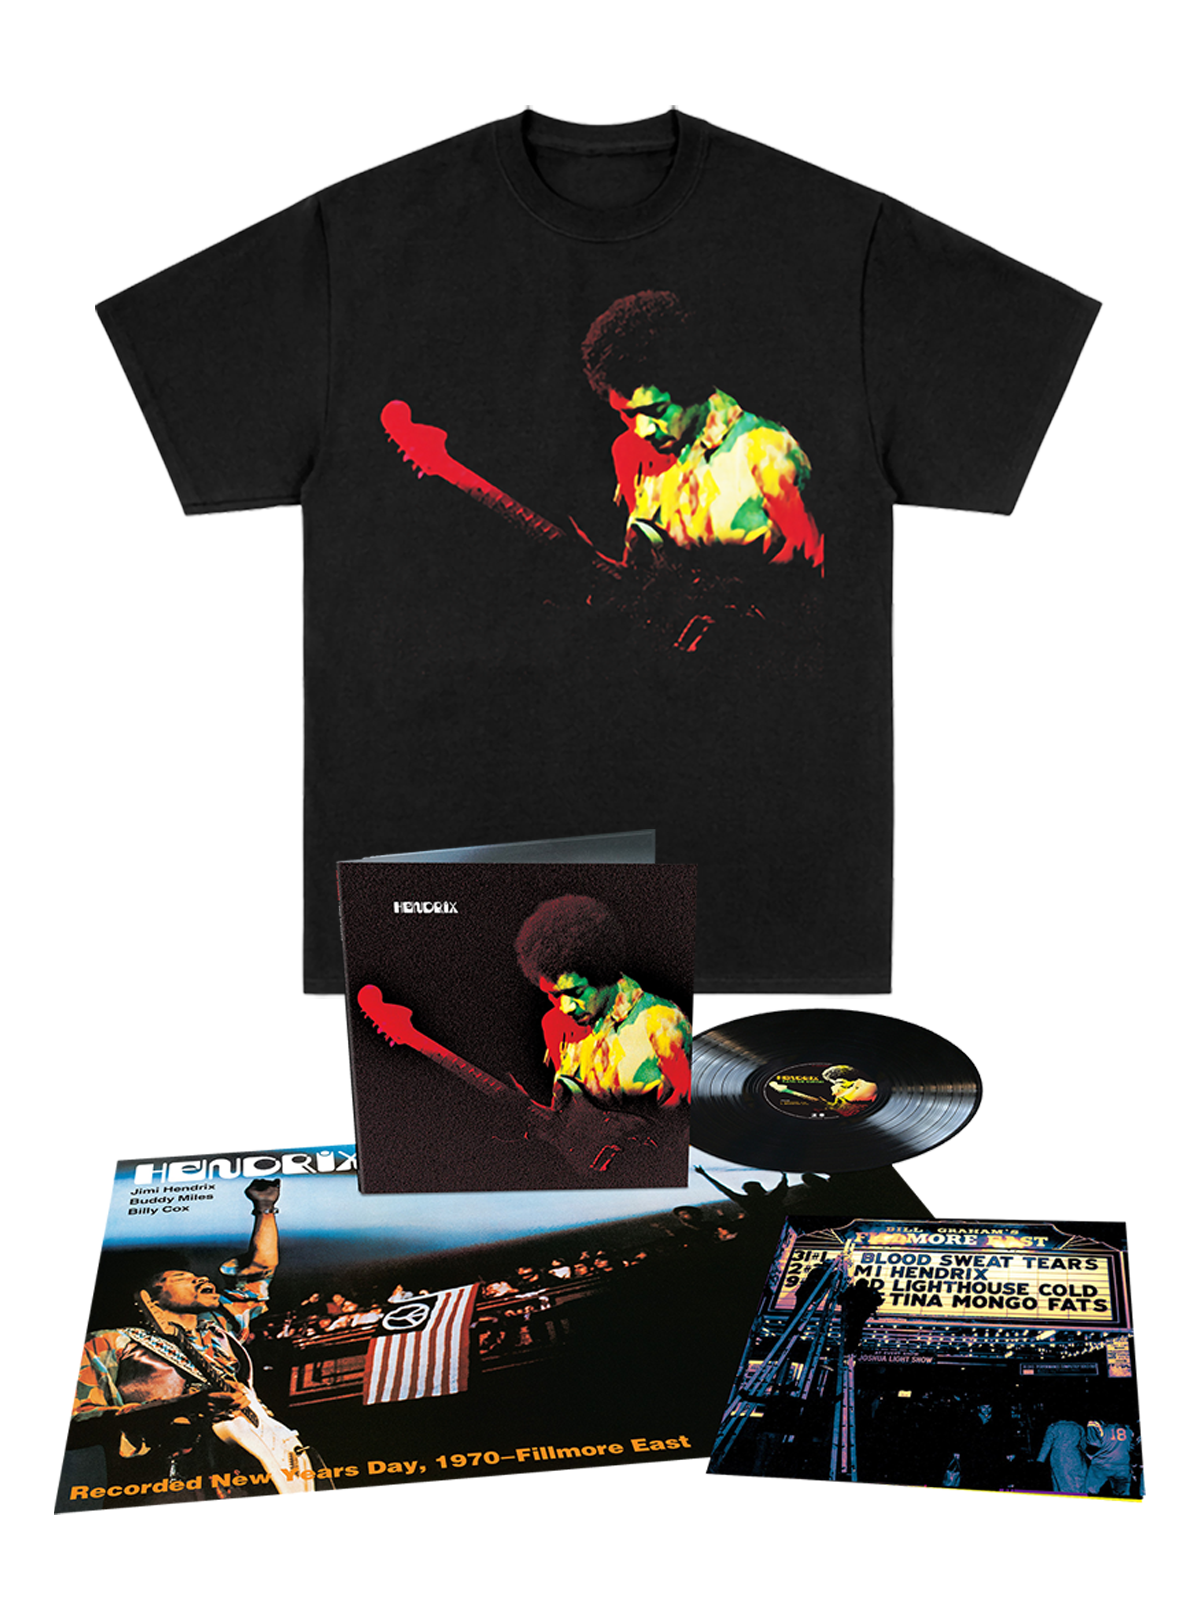 Band of Gypsys T-Shirt + Anniversary Analog LP